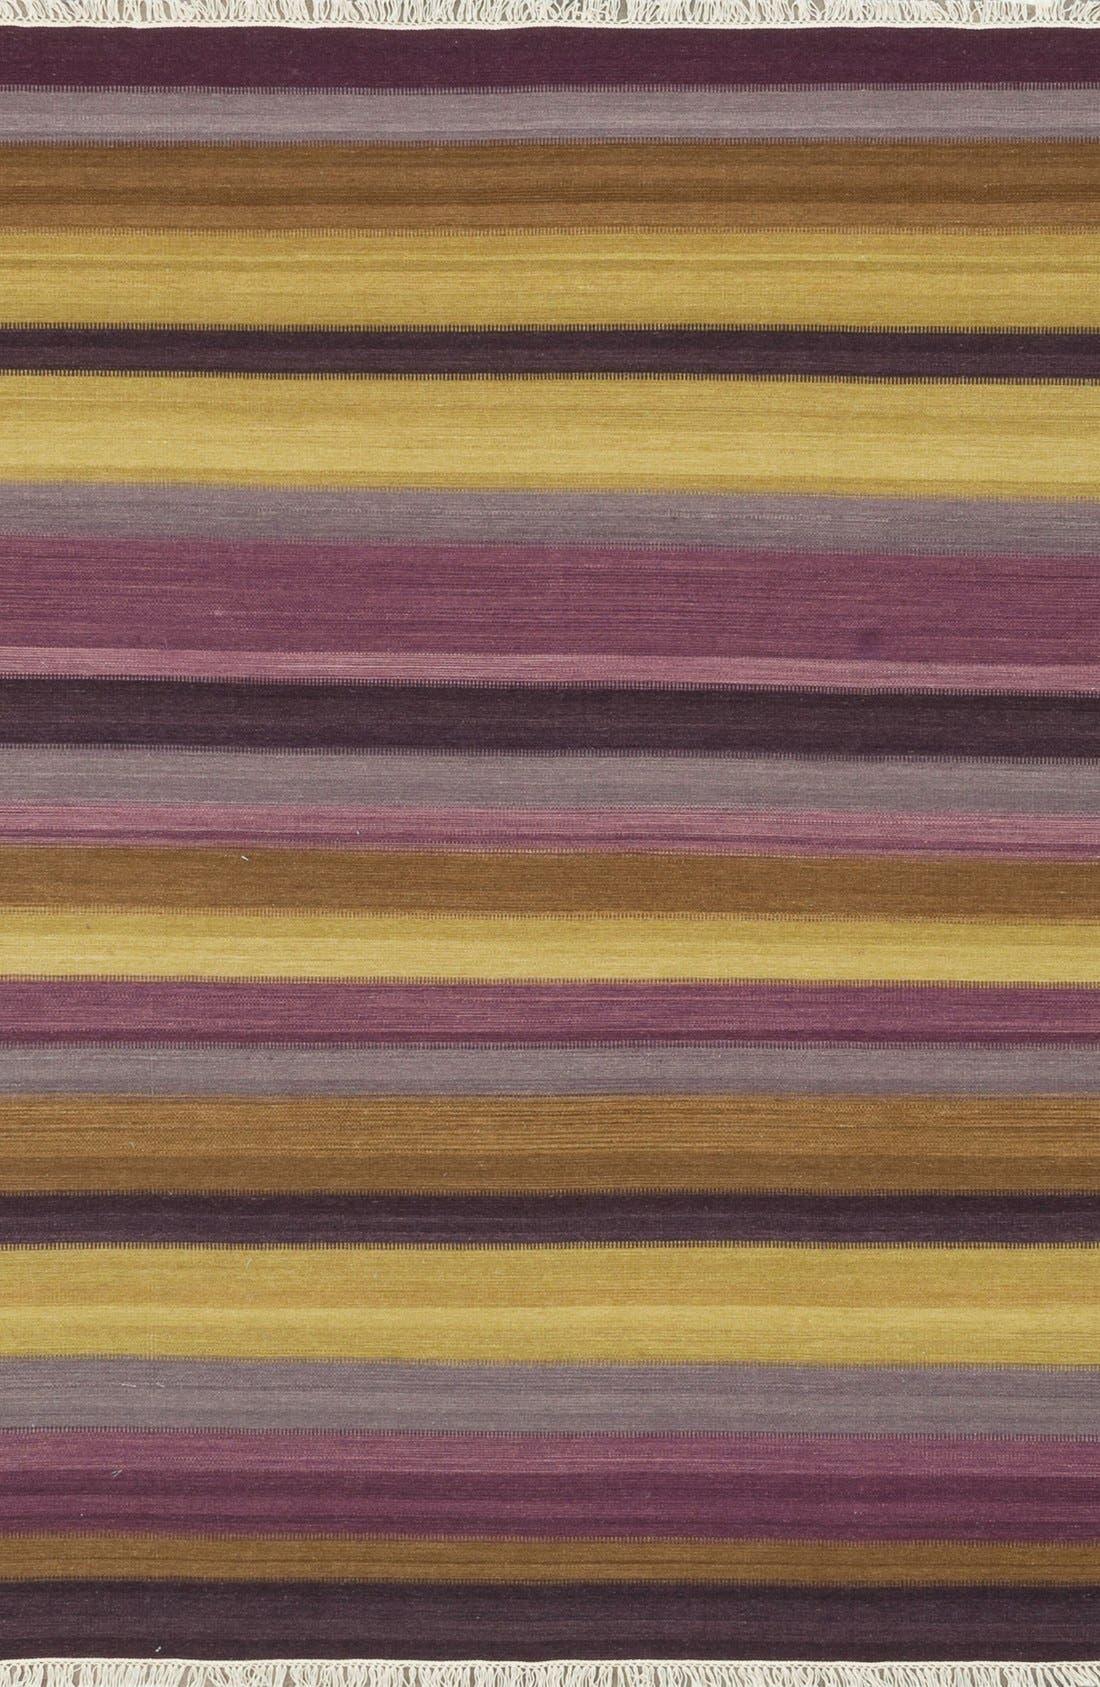 Main Image - Loloi 'Santana' Woven Wool Rug